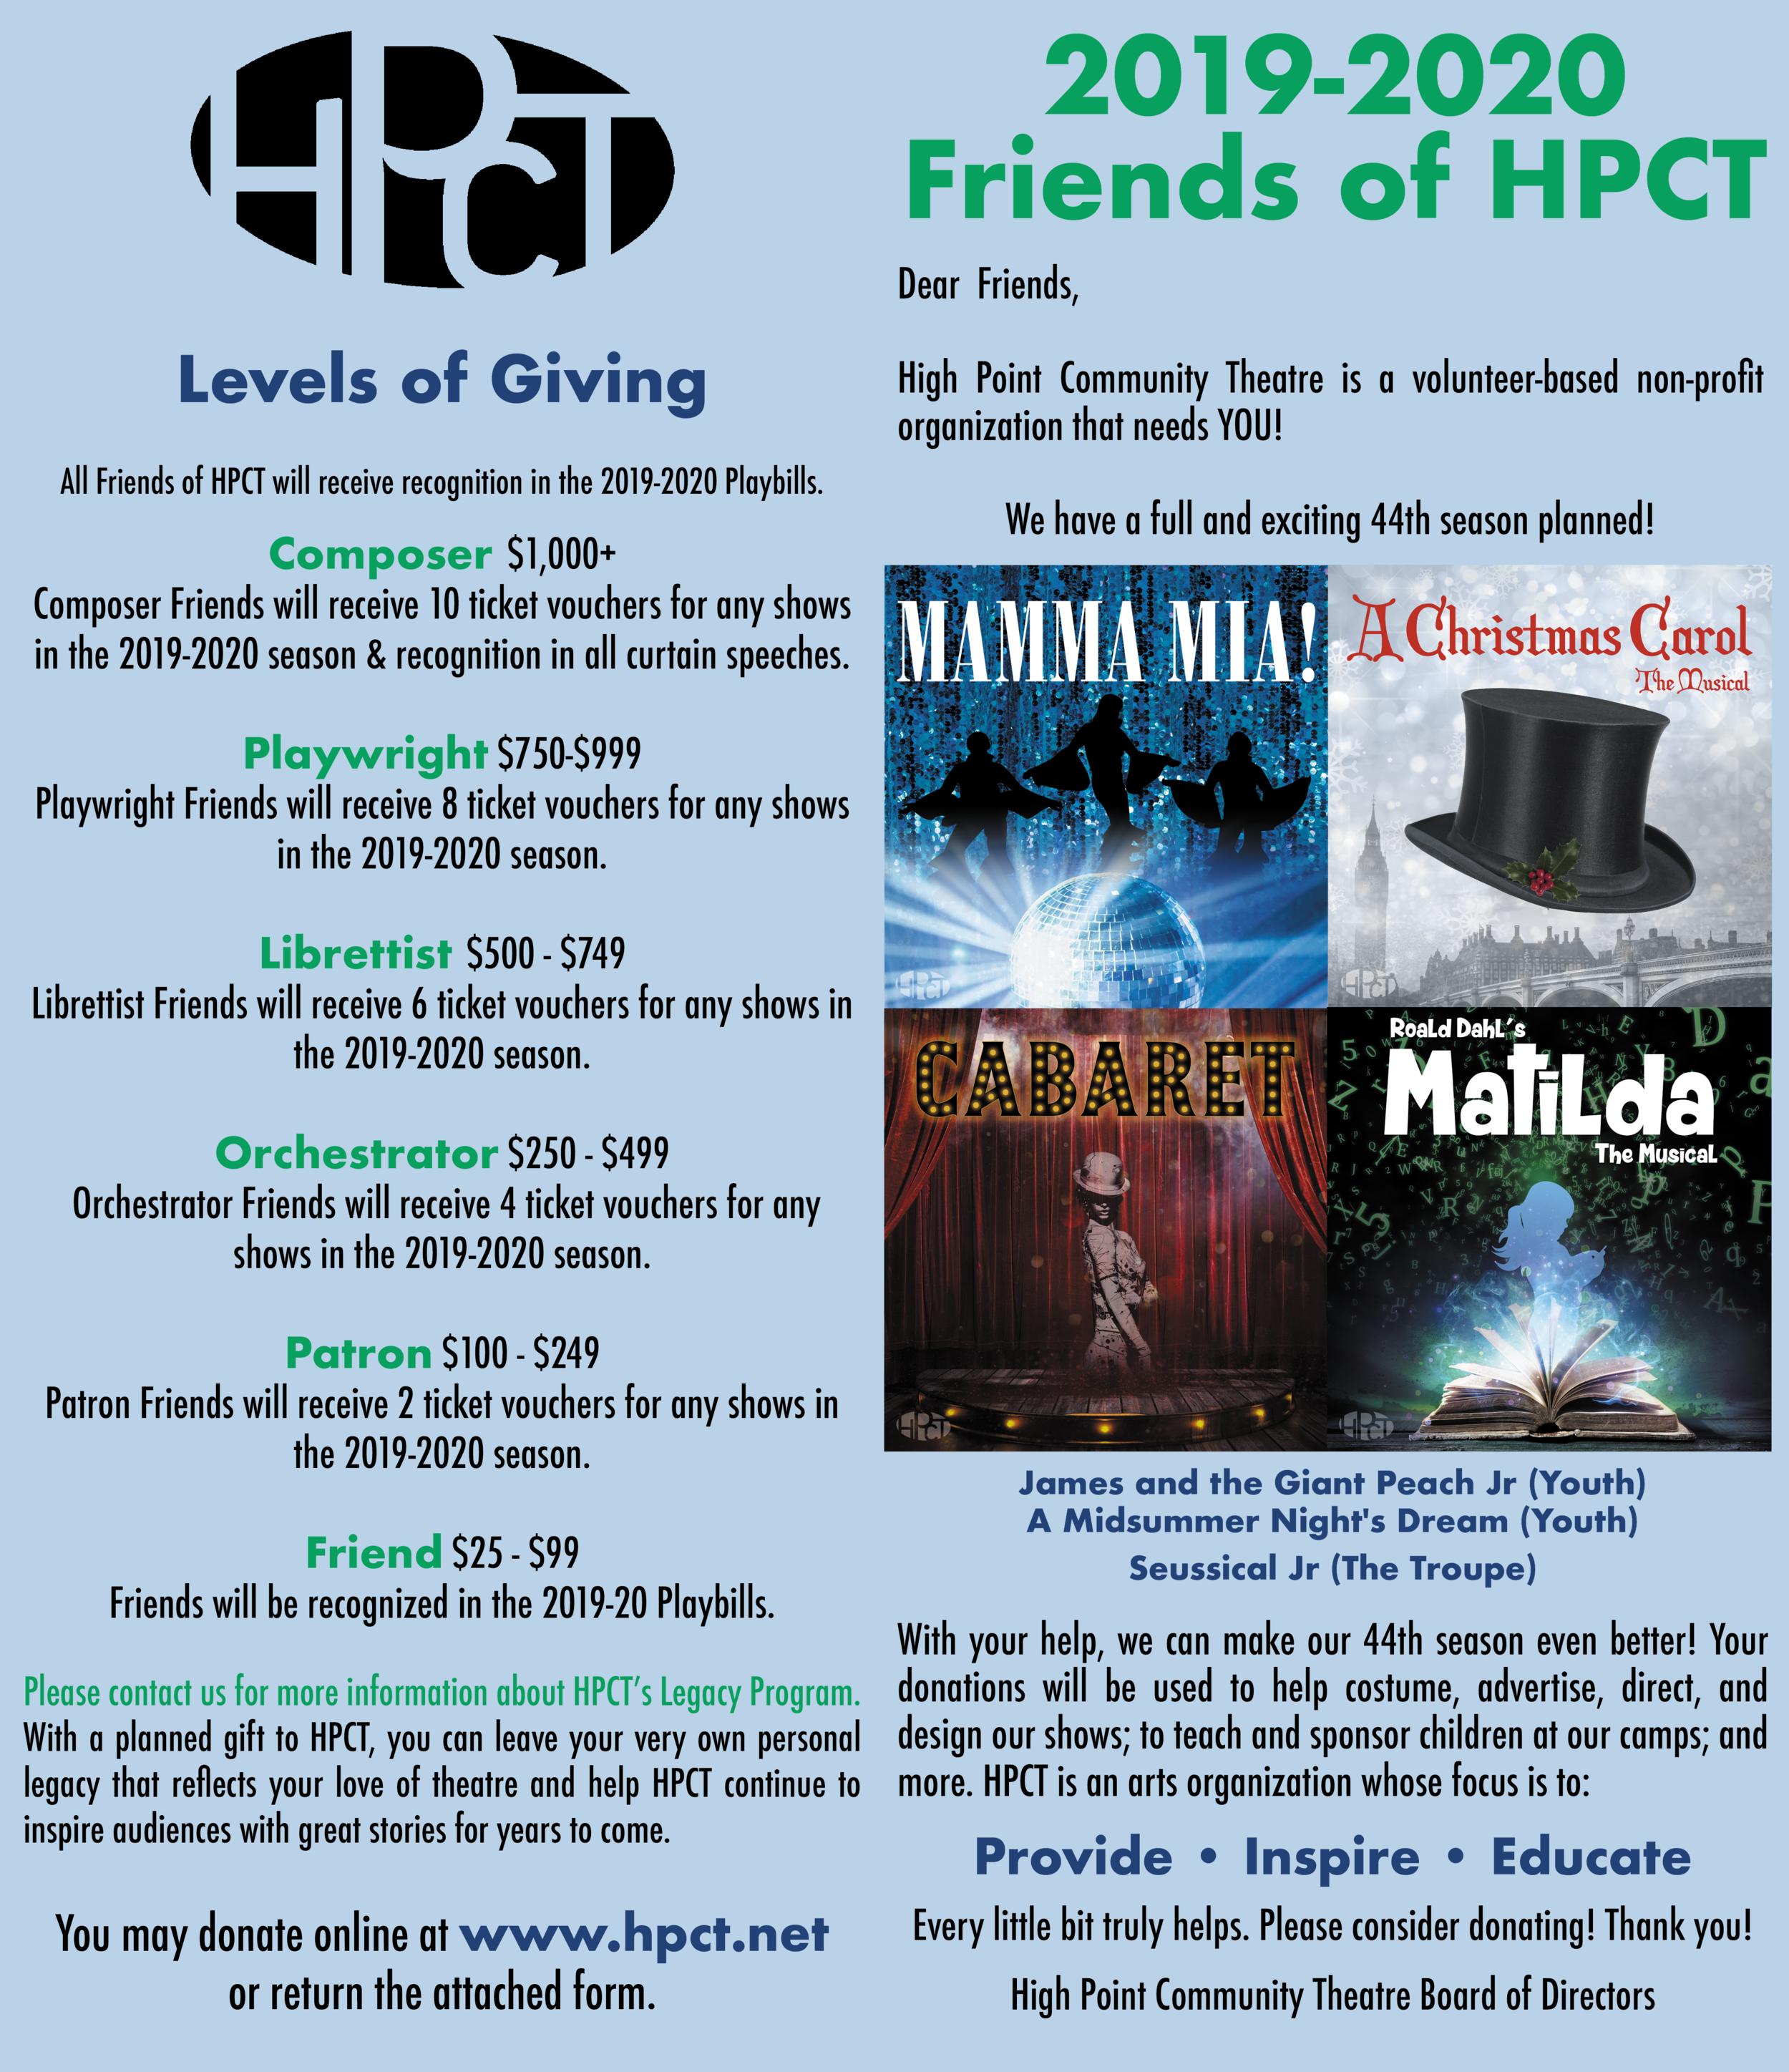 2019-20 HPCT Friends Form2.png